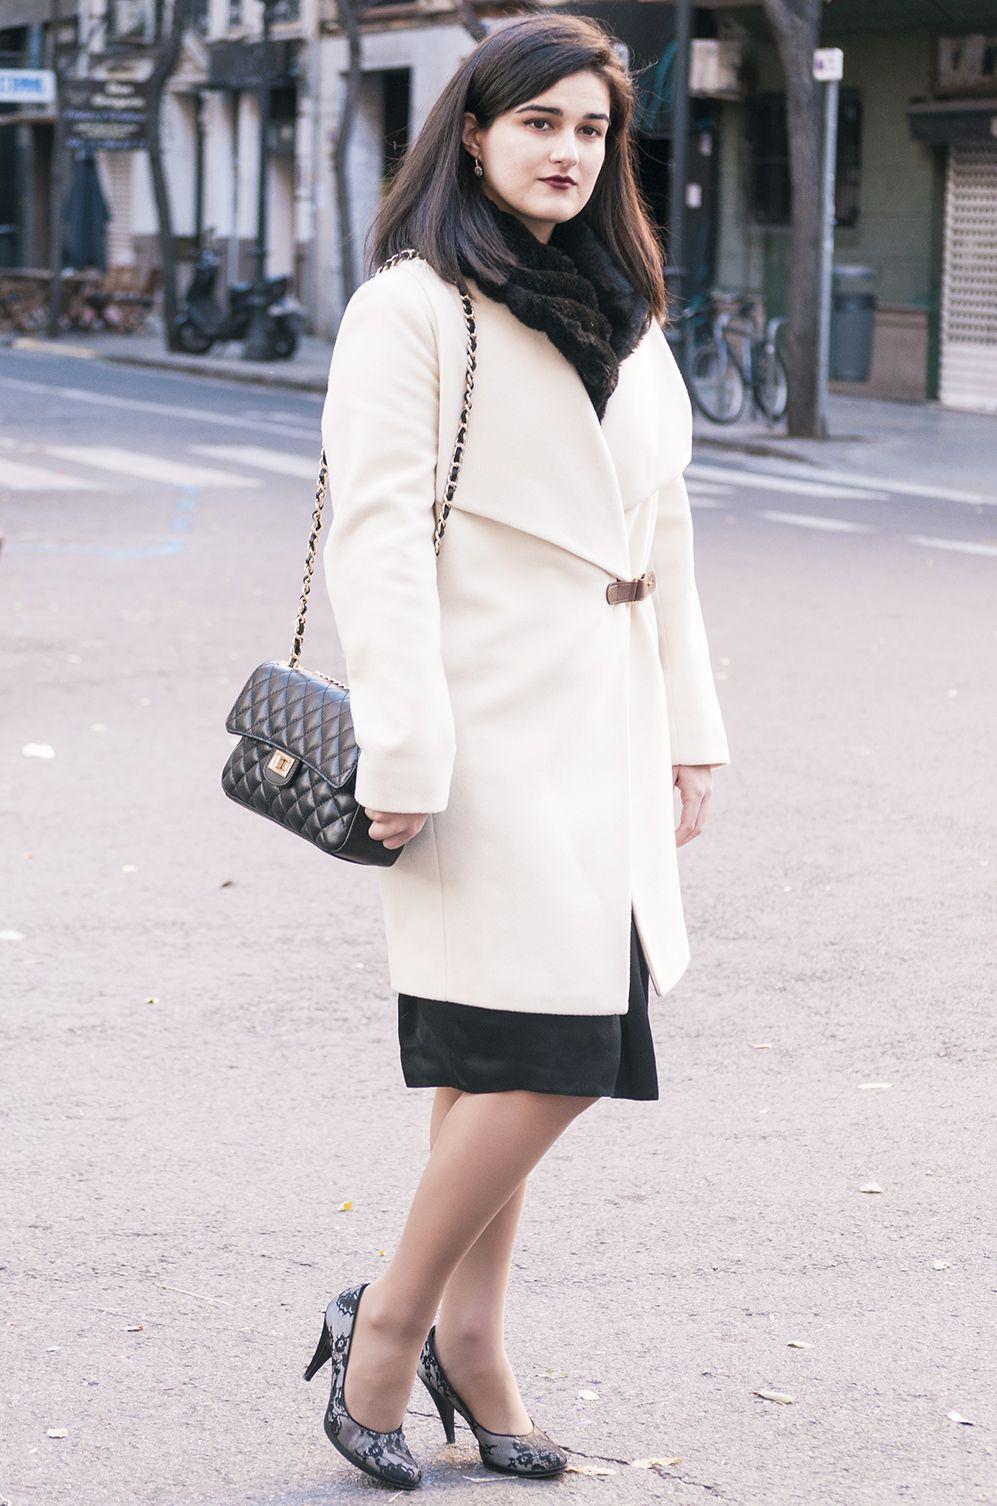 Somethingfashion valencia spain italy firenze fashionblogger white